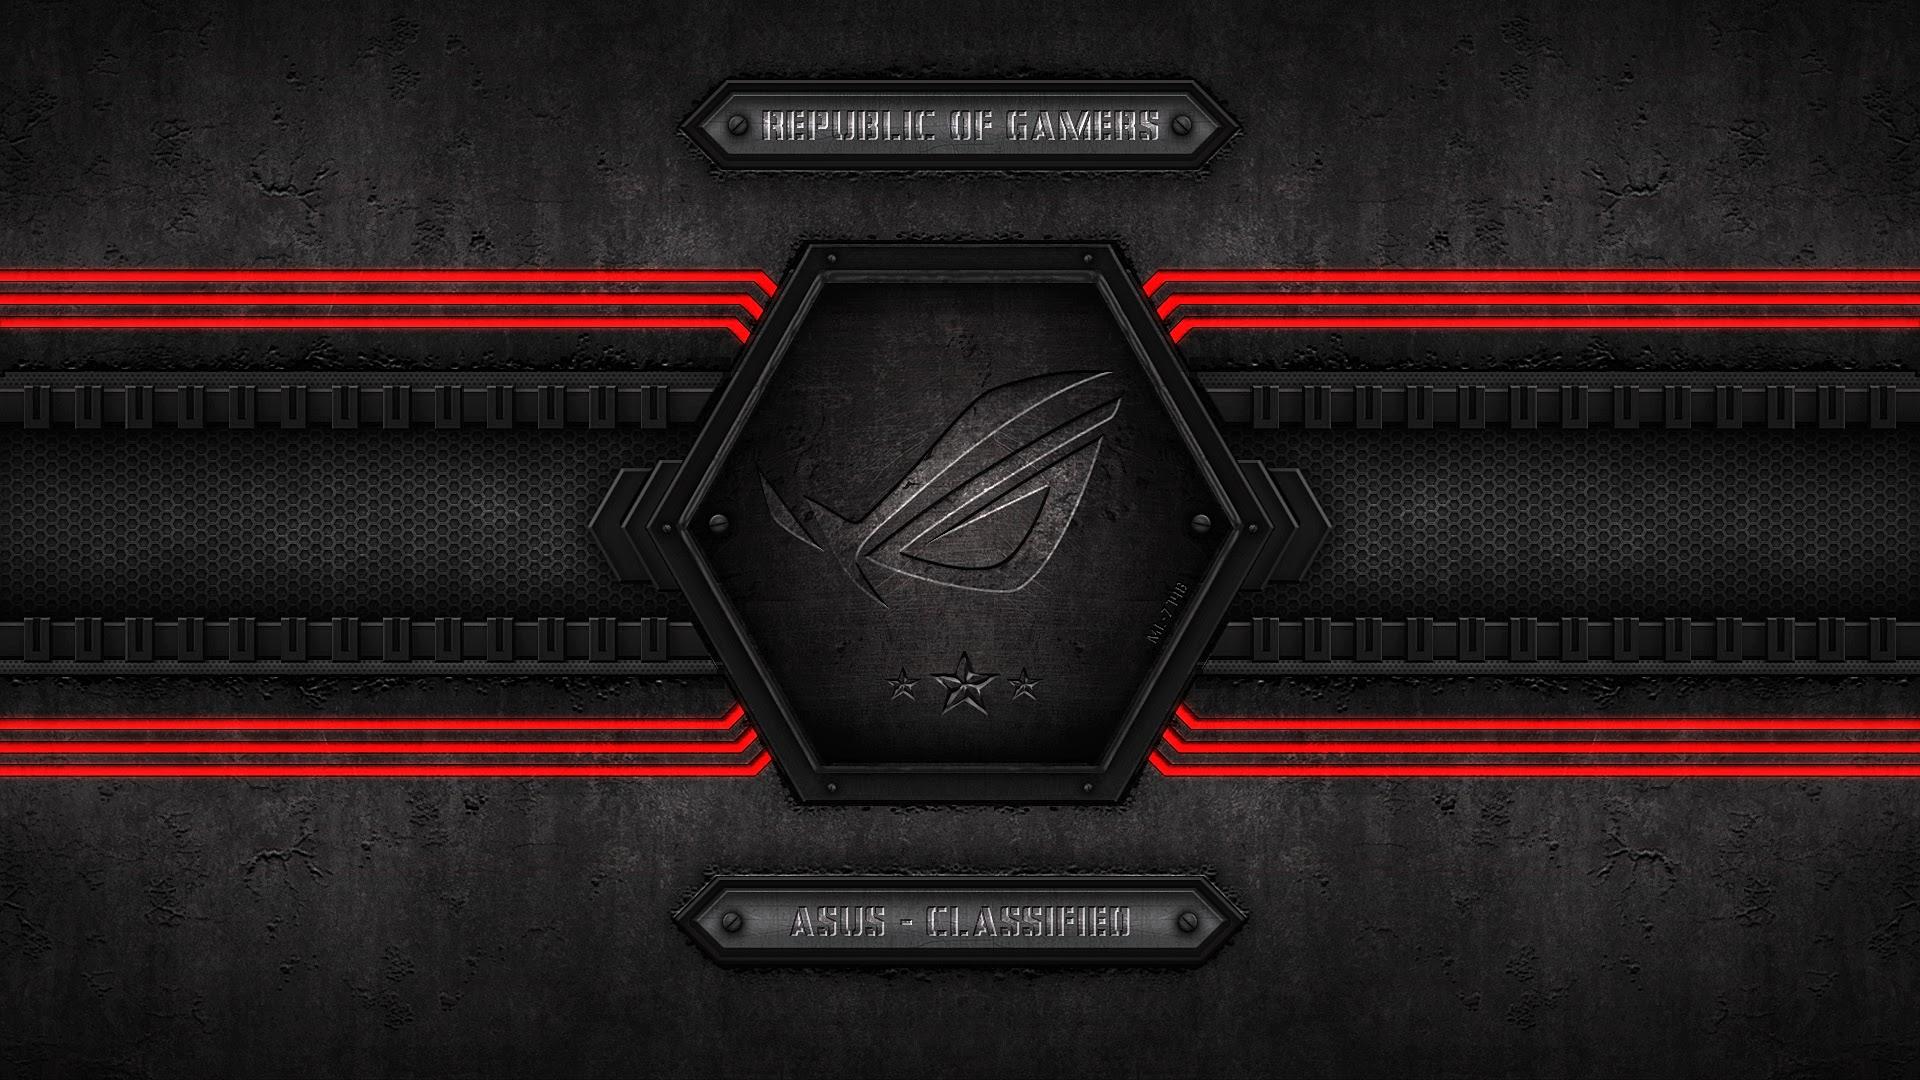 Pics photos rog blue background republic of gamers asus gamer asus - Asus Republic Of Gamers Rog Logo Hd Wallpaper